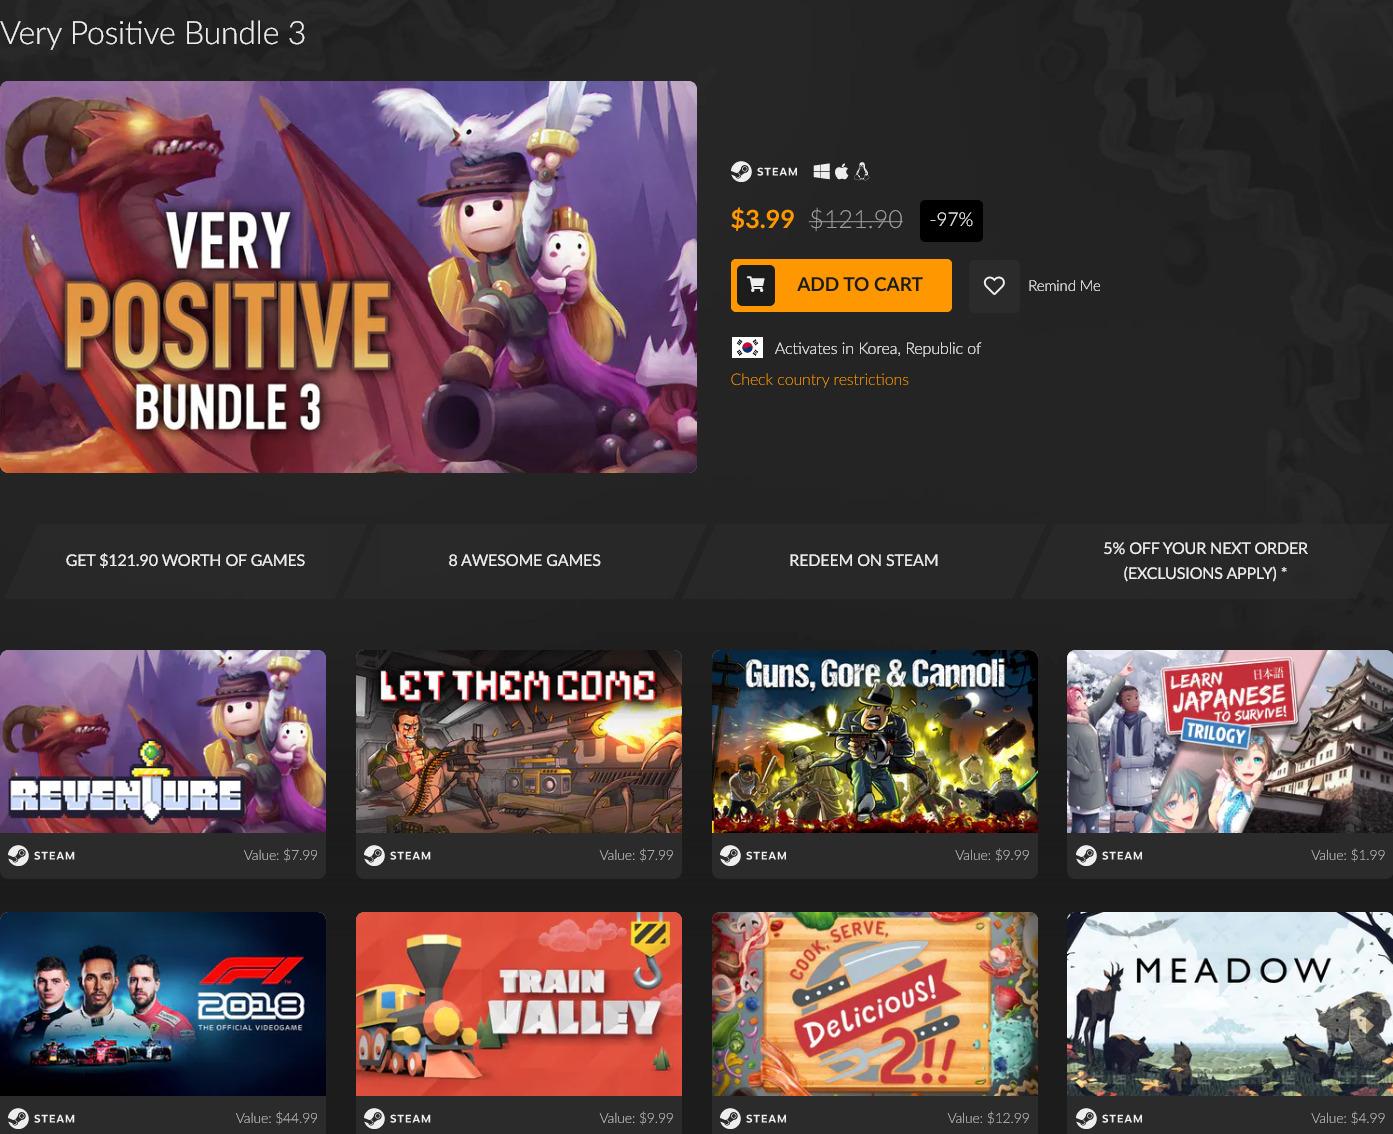 Screenshot_2020-07-28 Very Positive Bundle 3 Steam Game Bundle Fanatical.jpg